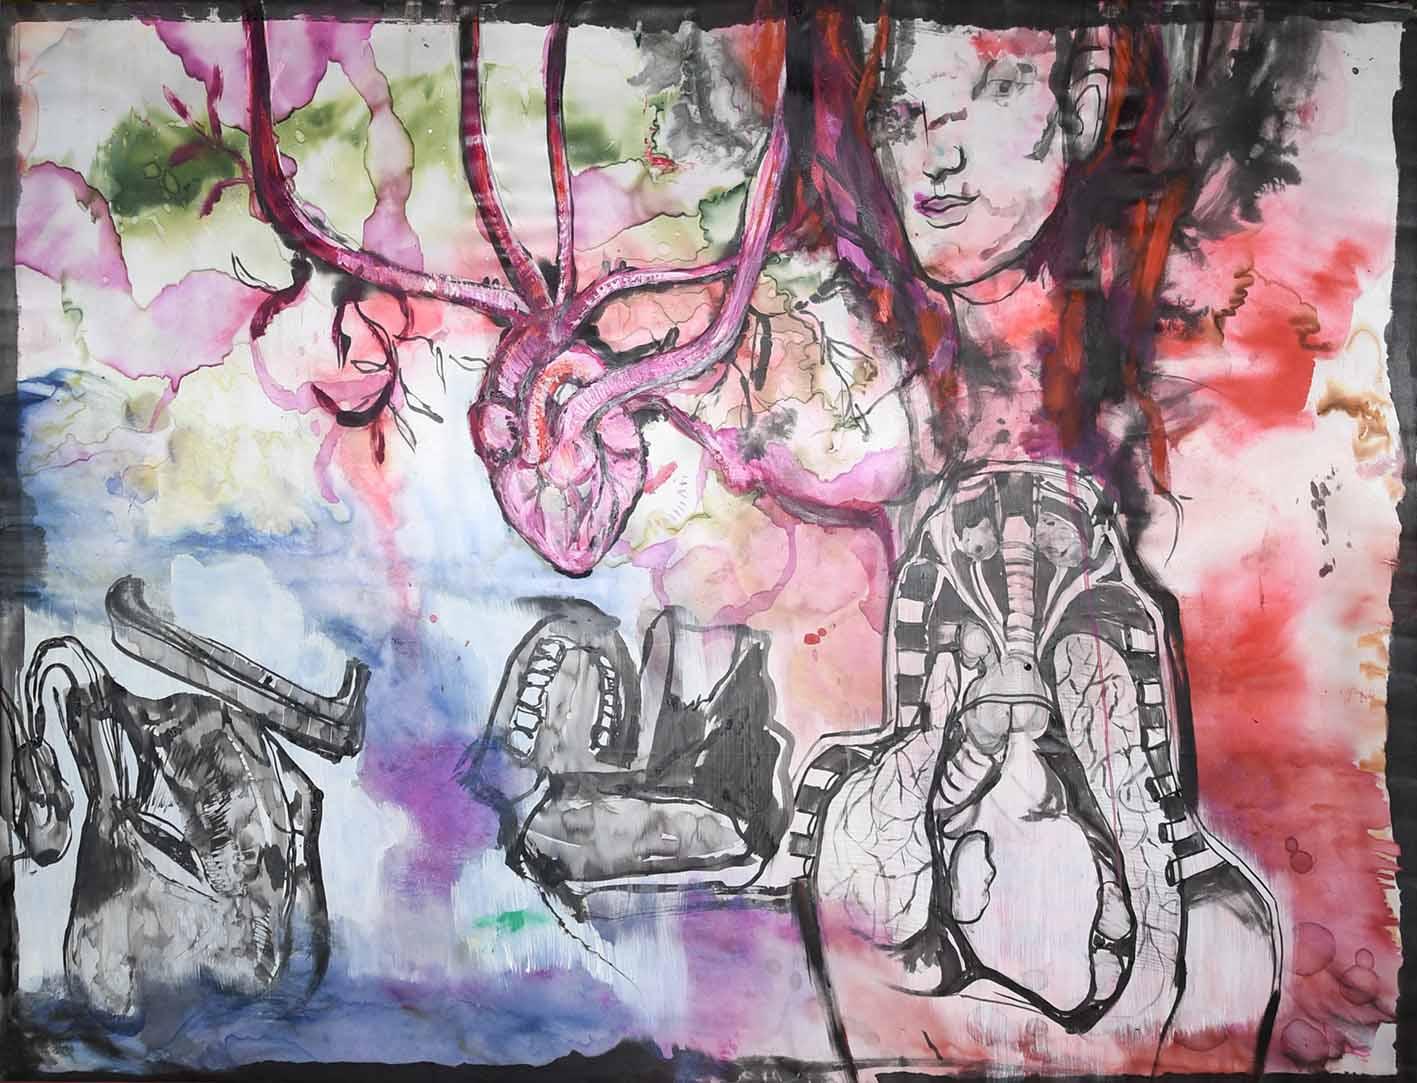 ID Life Tapestries No14, 141x108cm, mixed media on silk, 2018